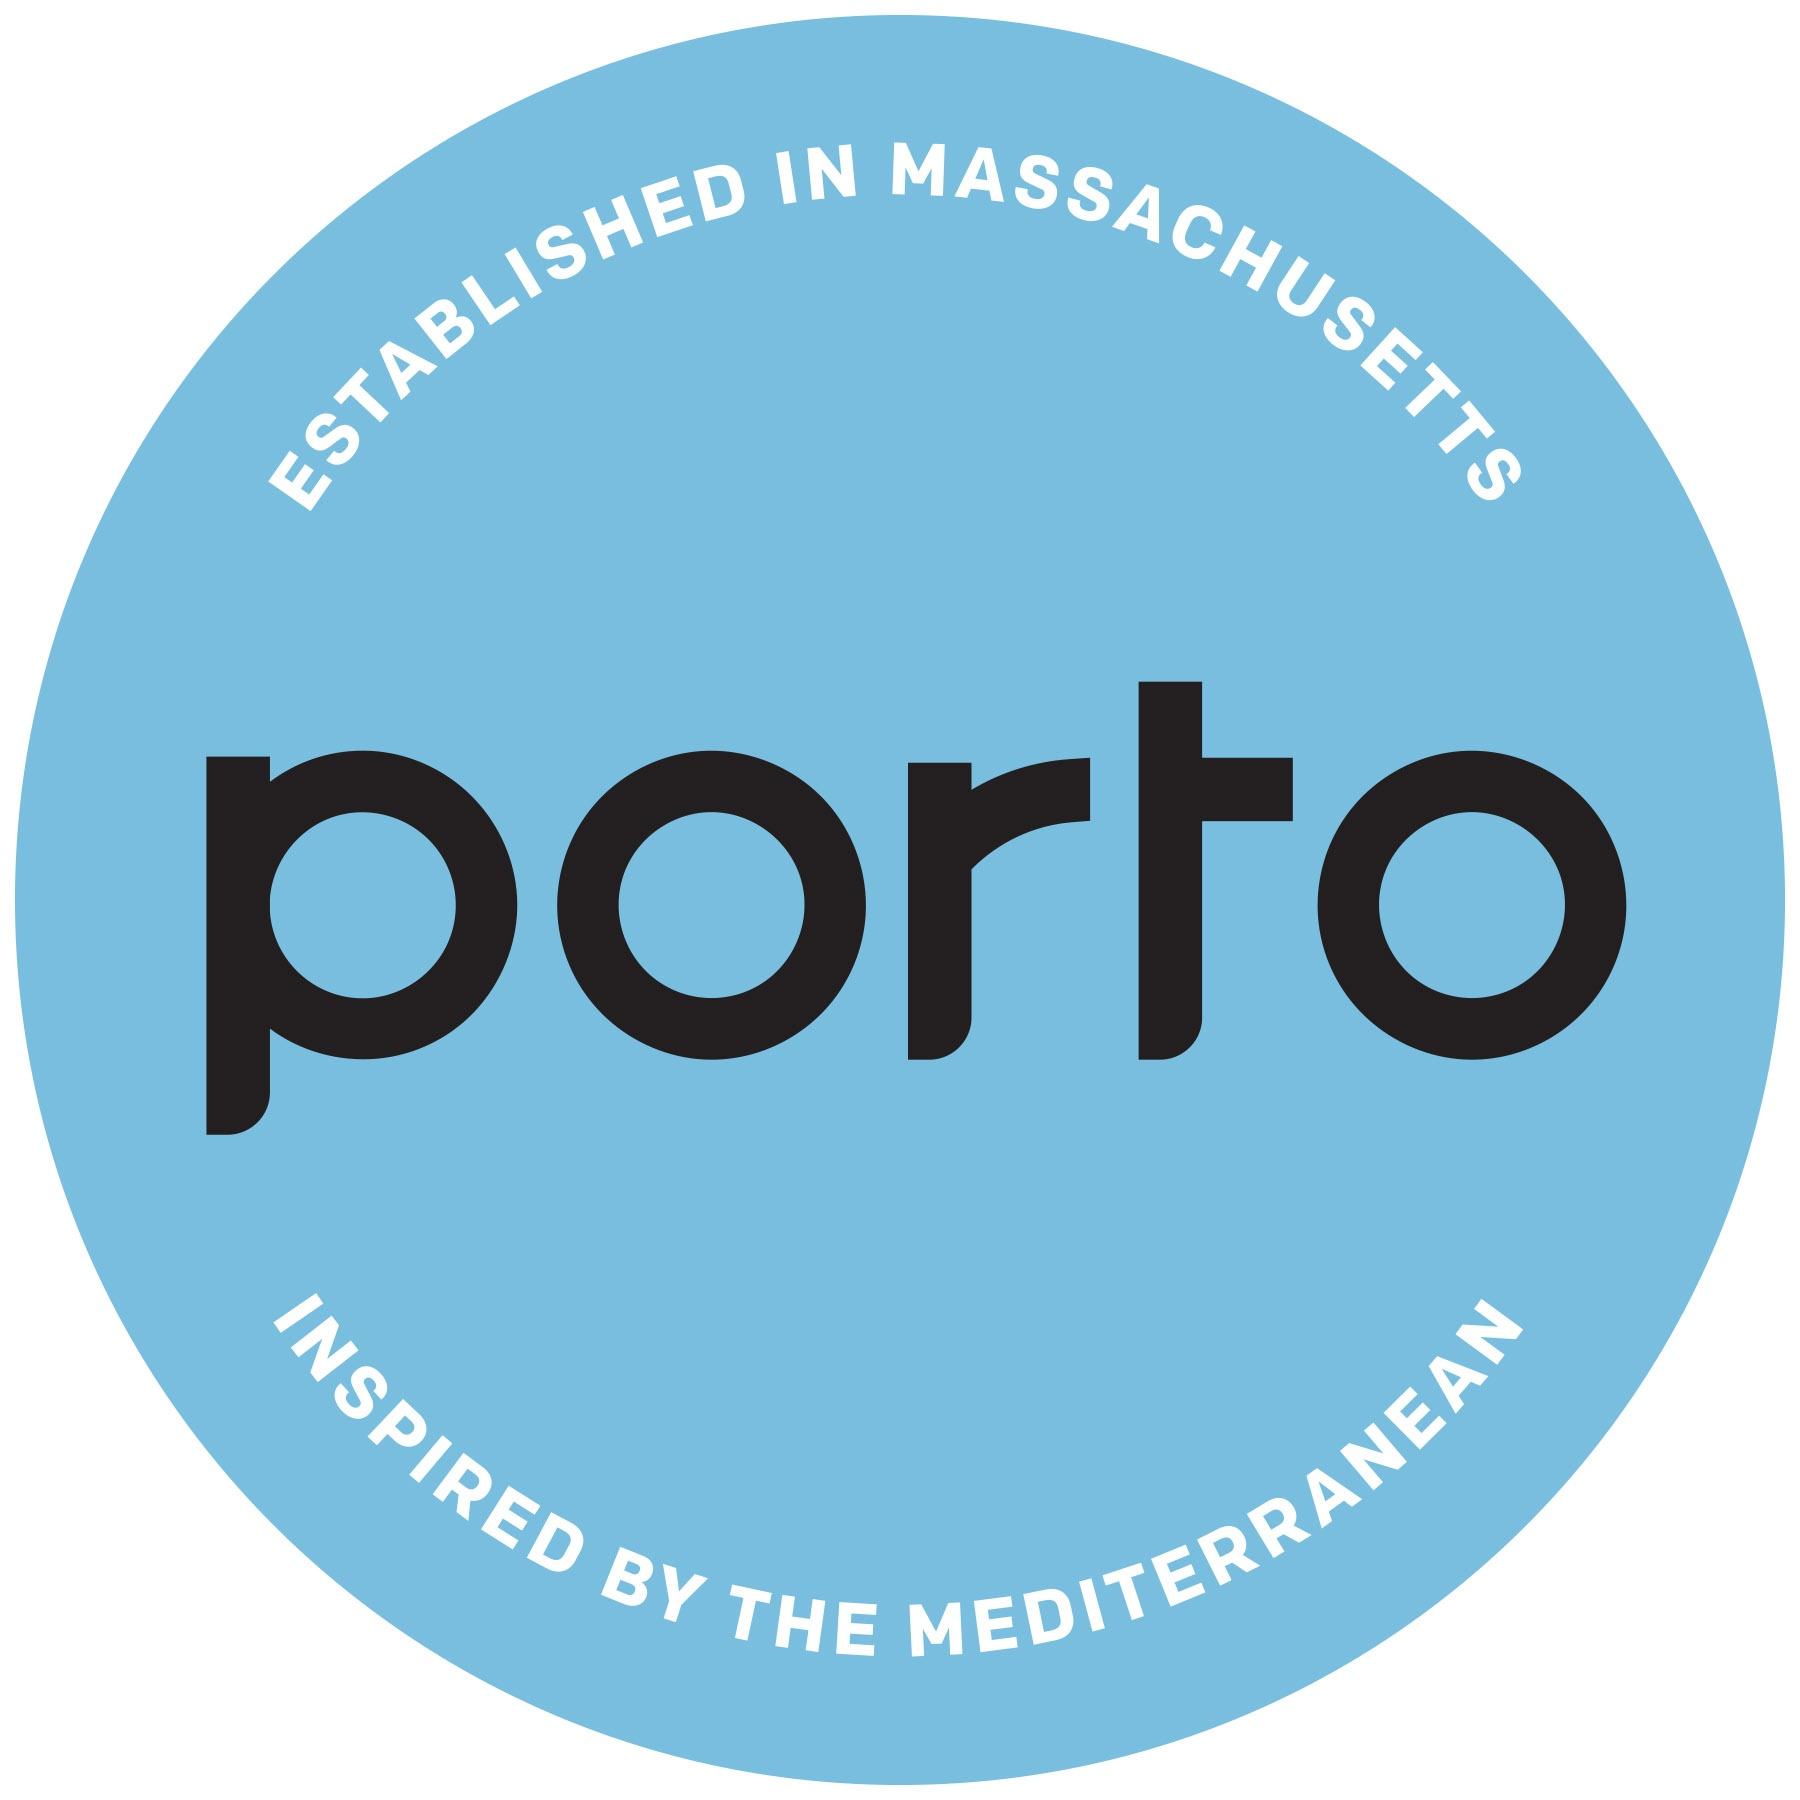 http://www.porto-boston.com/